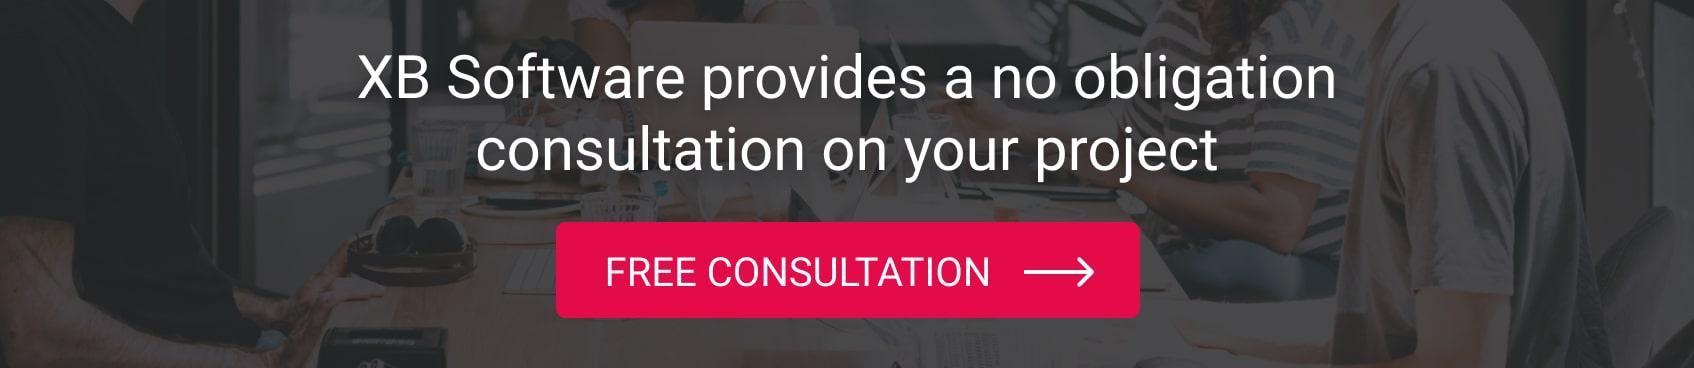 Get a no obligation consultation